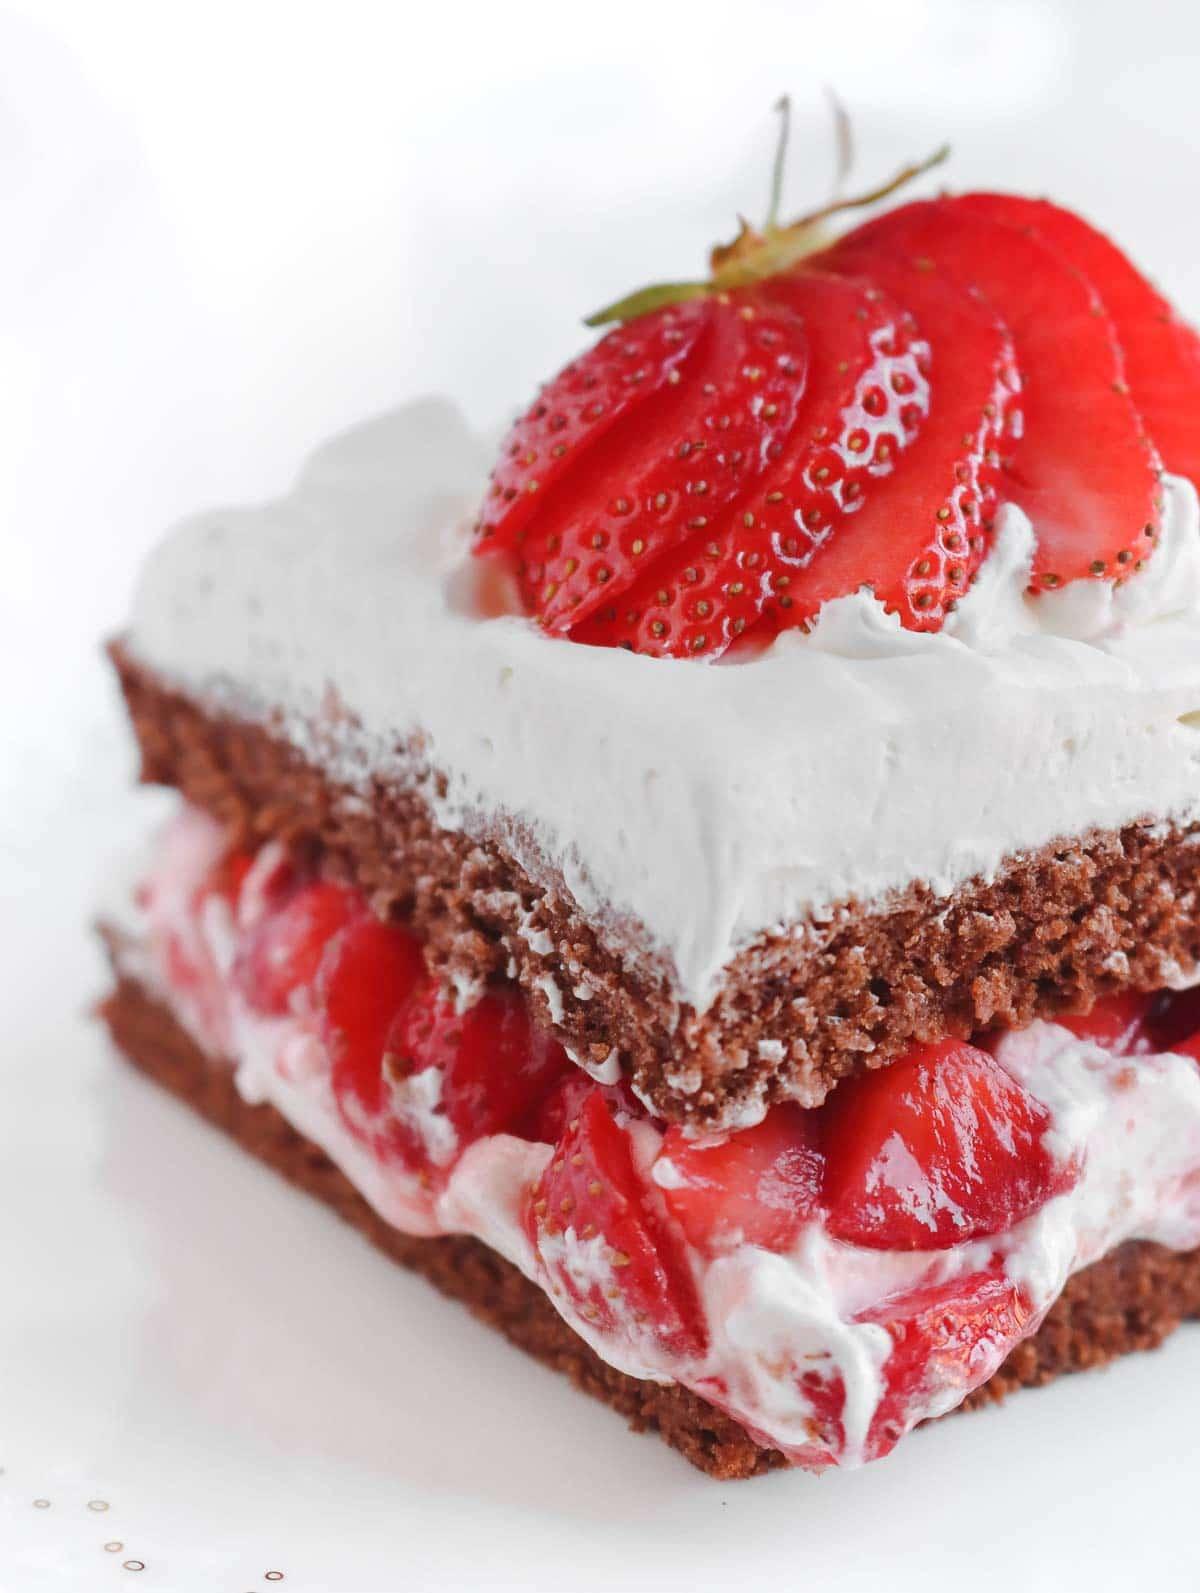 slice of vegan chocolate strawberry cake